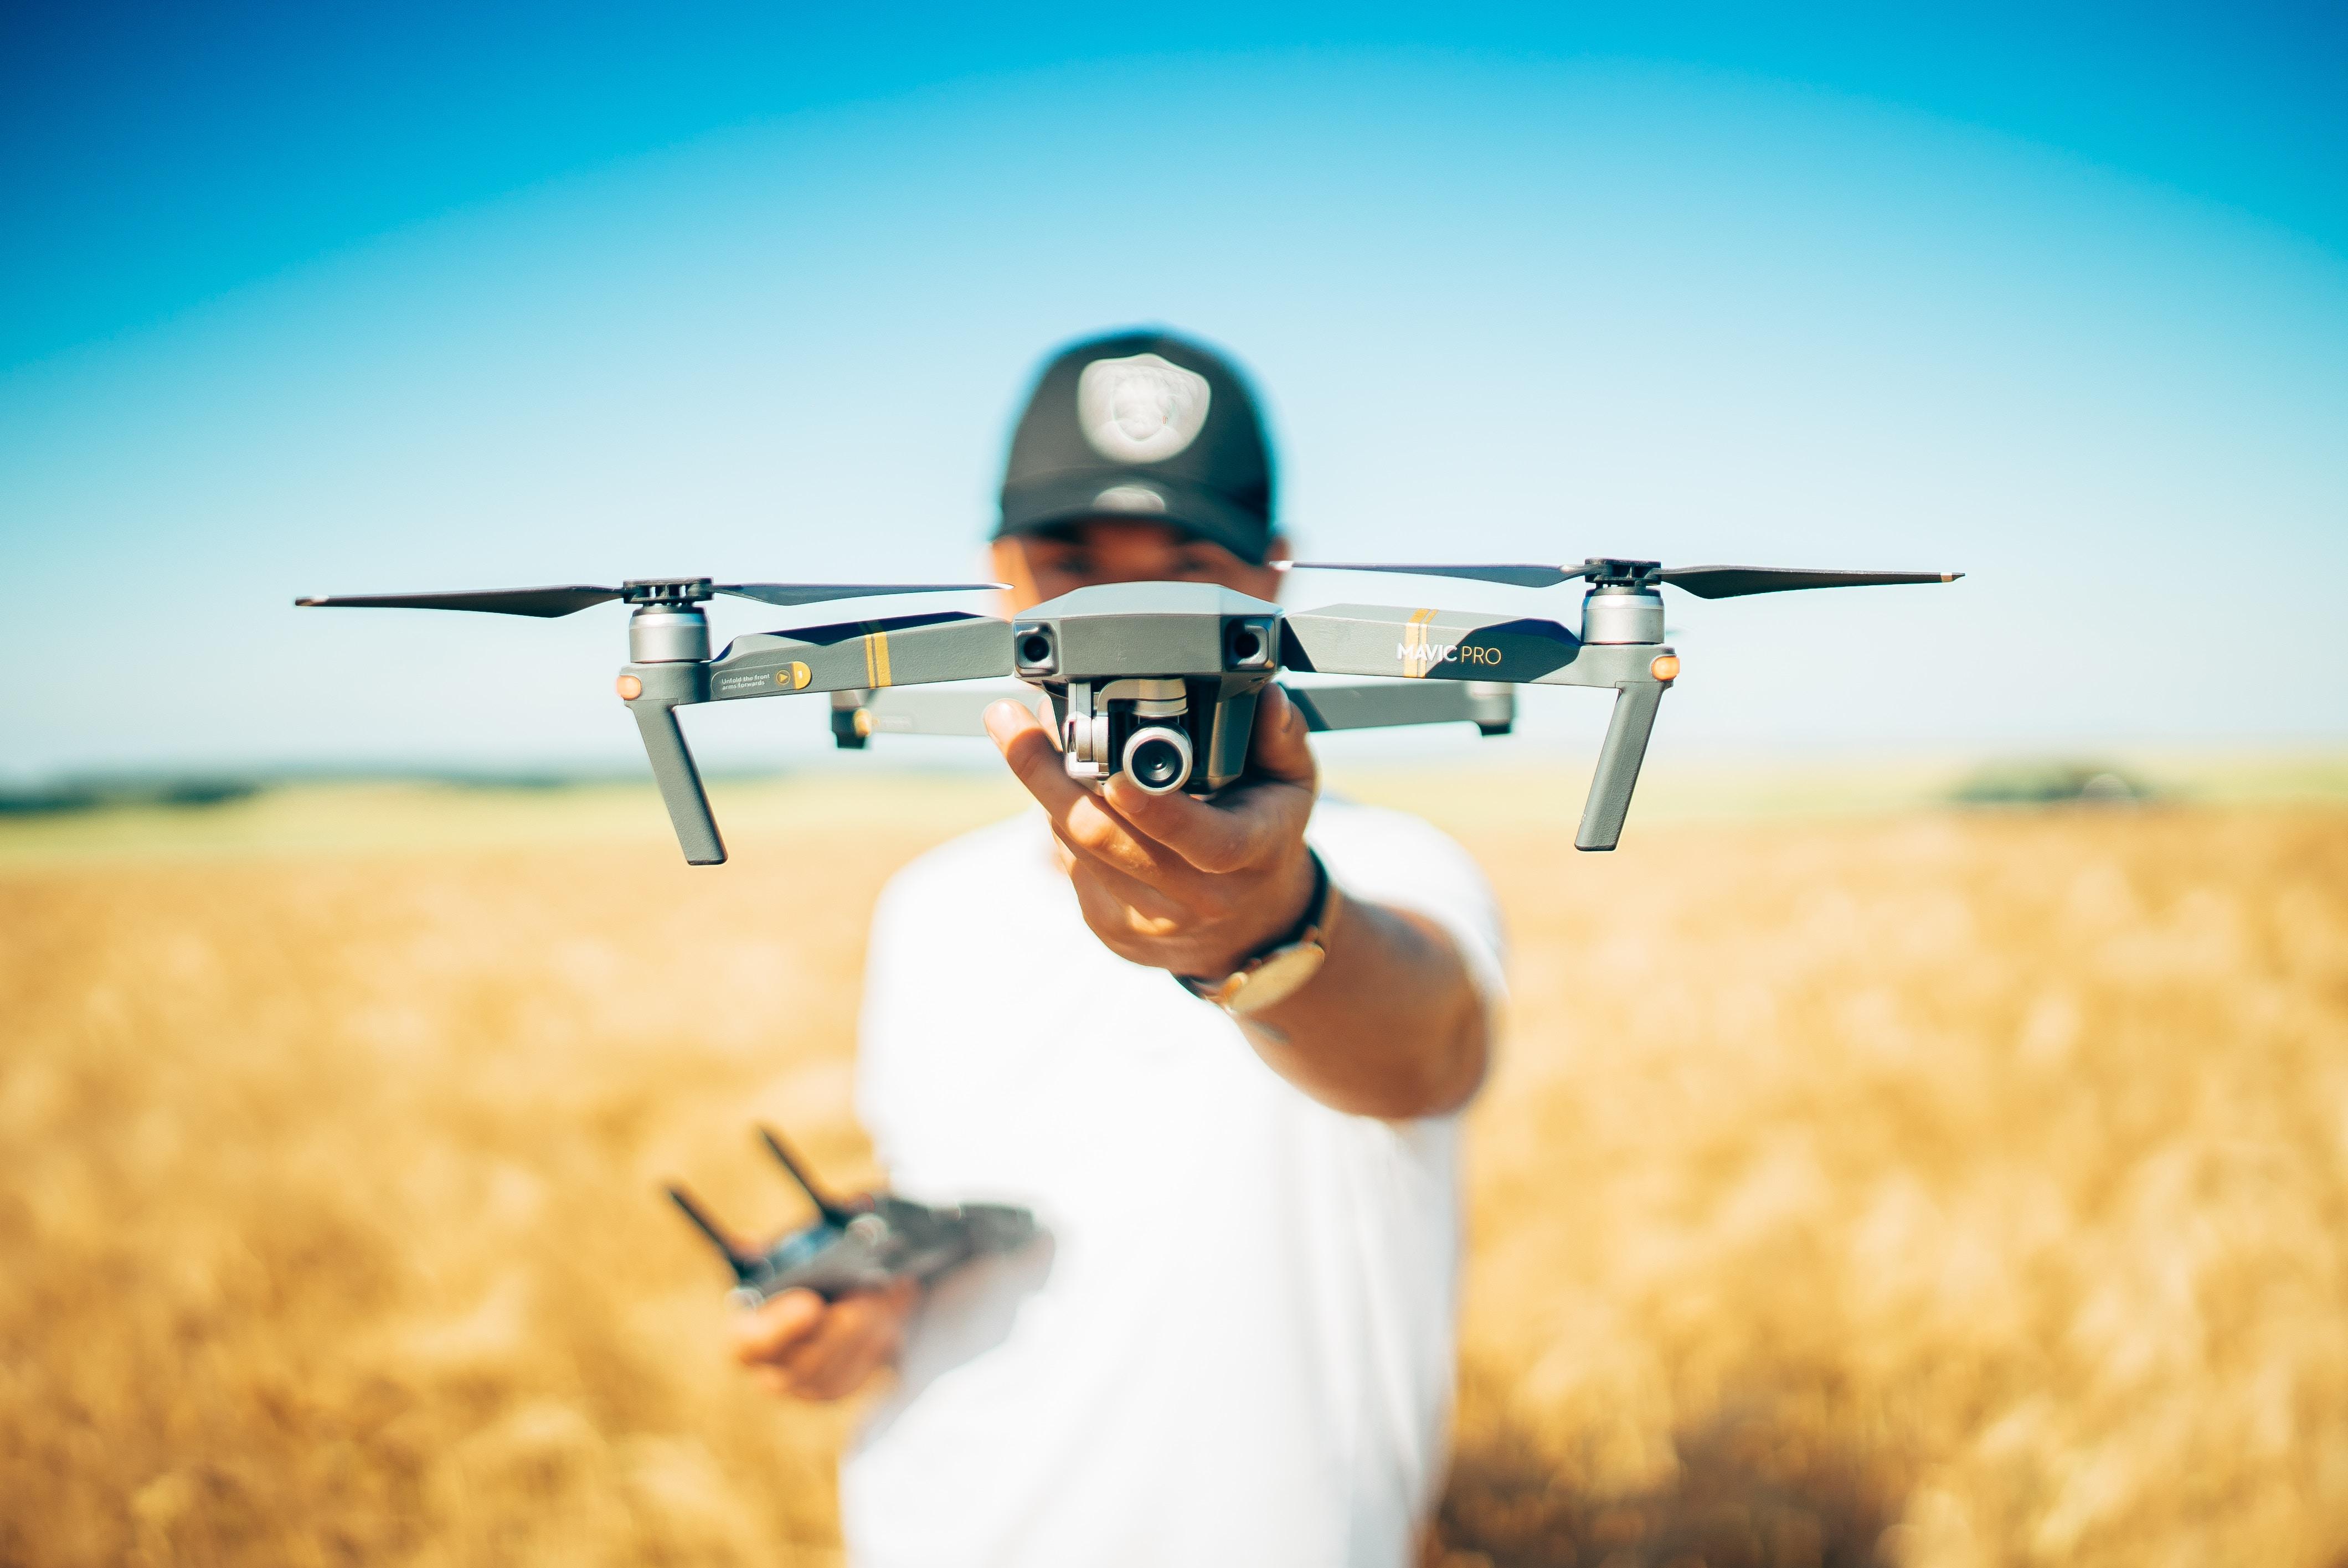 drone-david-henrichs-399195-unsplash.jpg